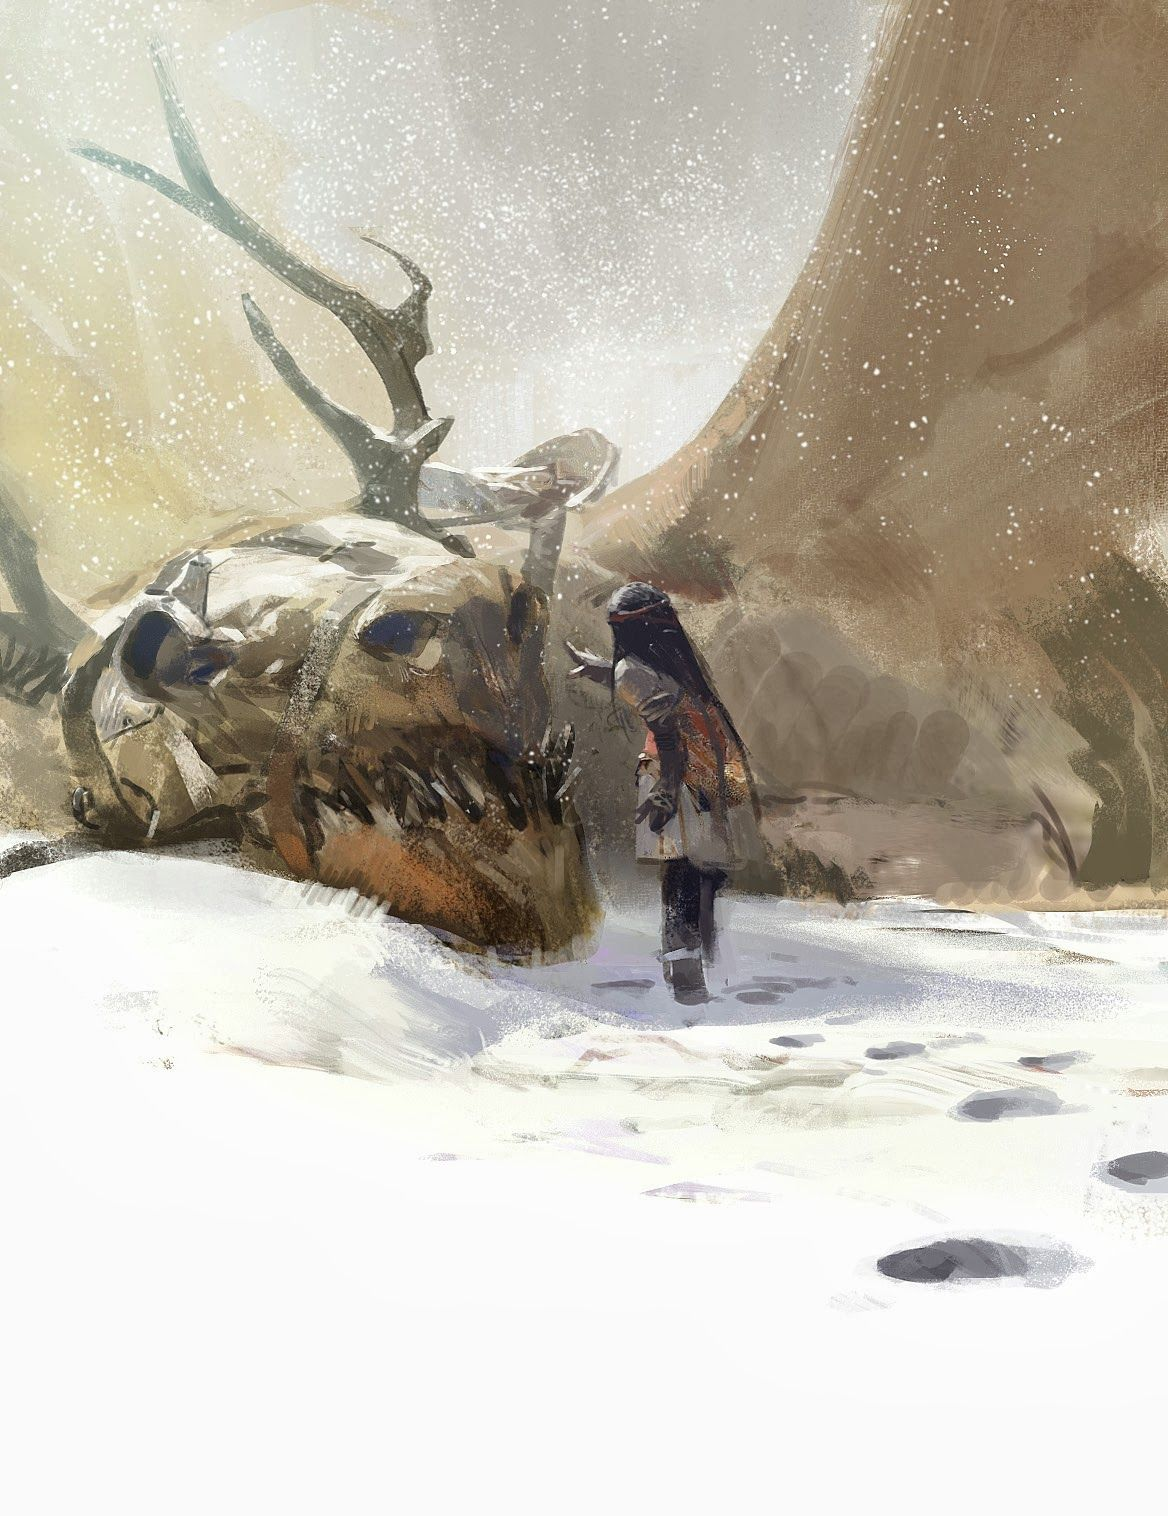 Pin by Addison Akins on Art | Fantasy art, Art, Dragon art